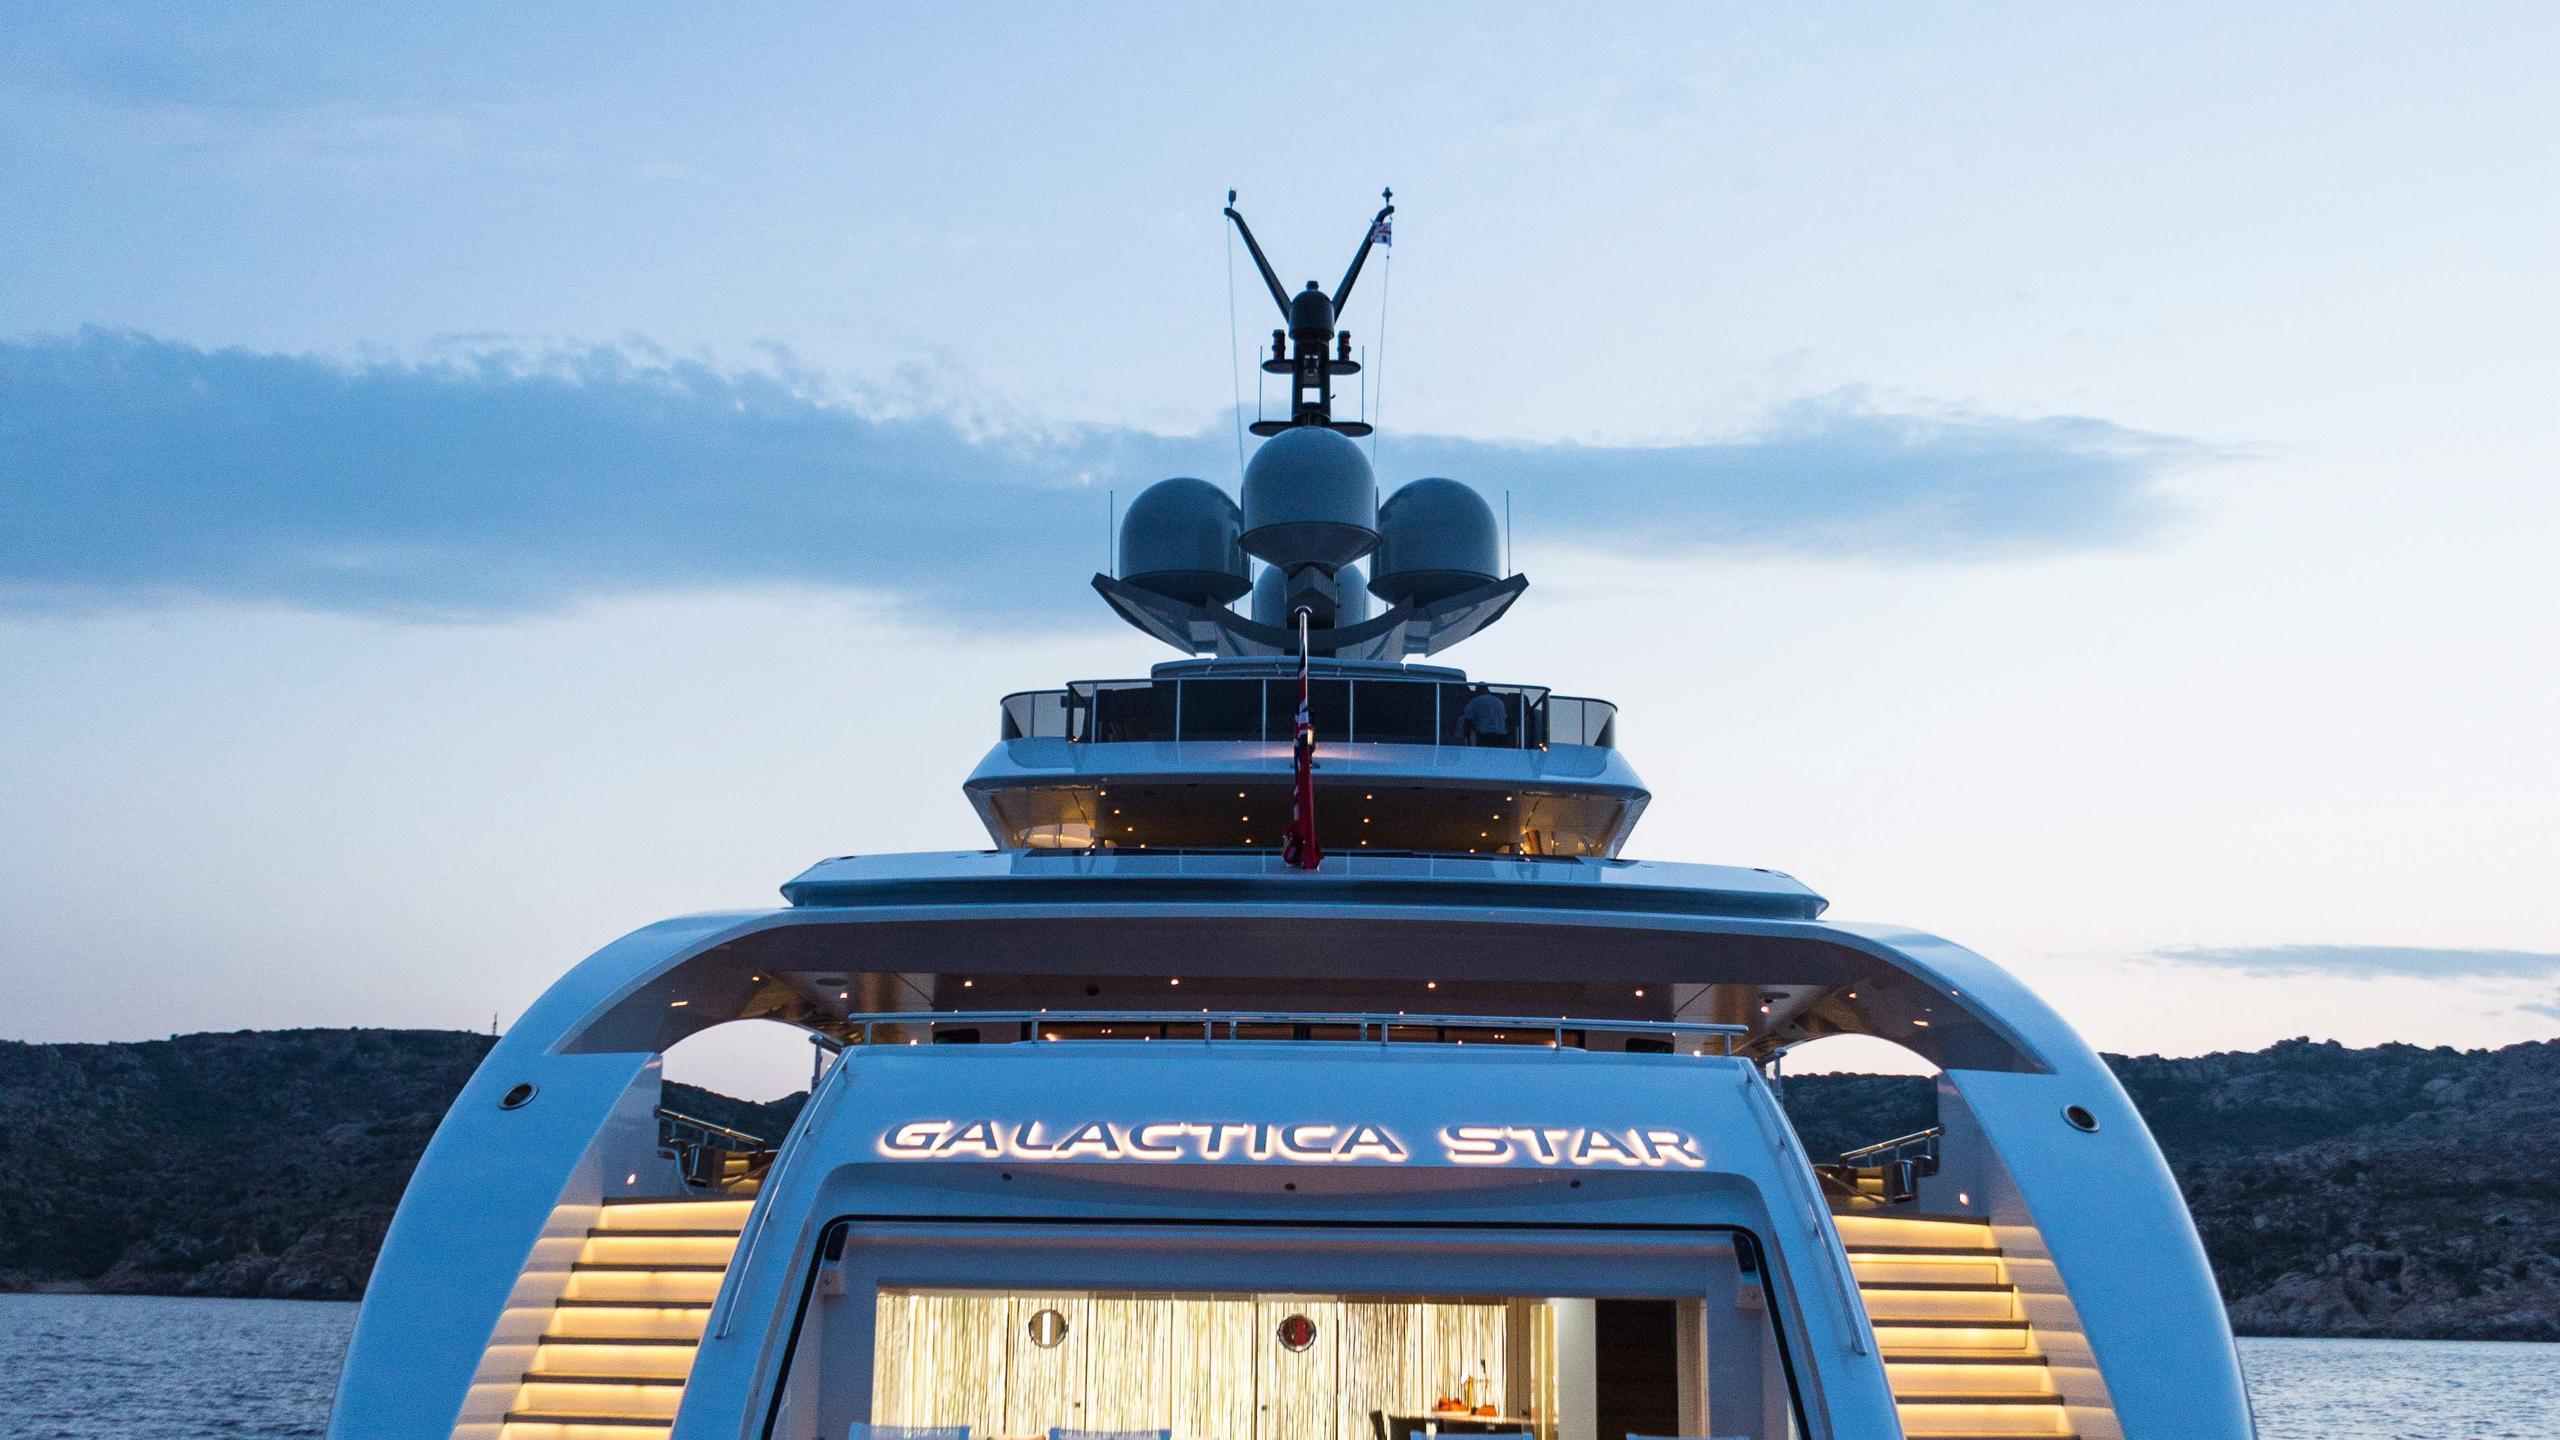 Galactica-Star-motor-yacht-heesen-2013-65m-berth